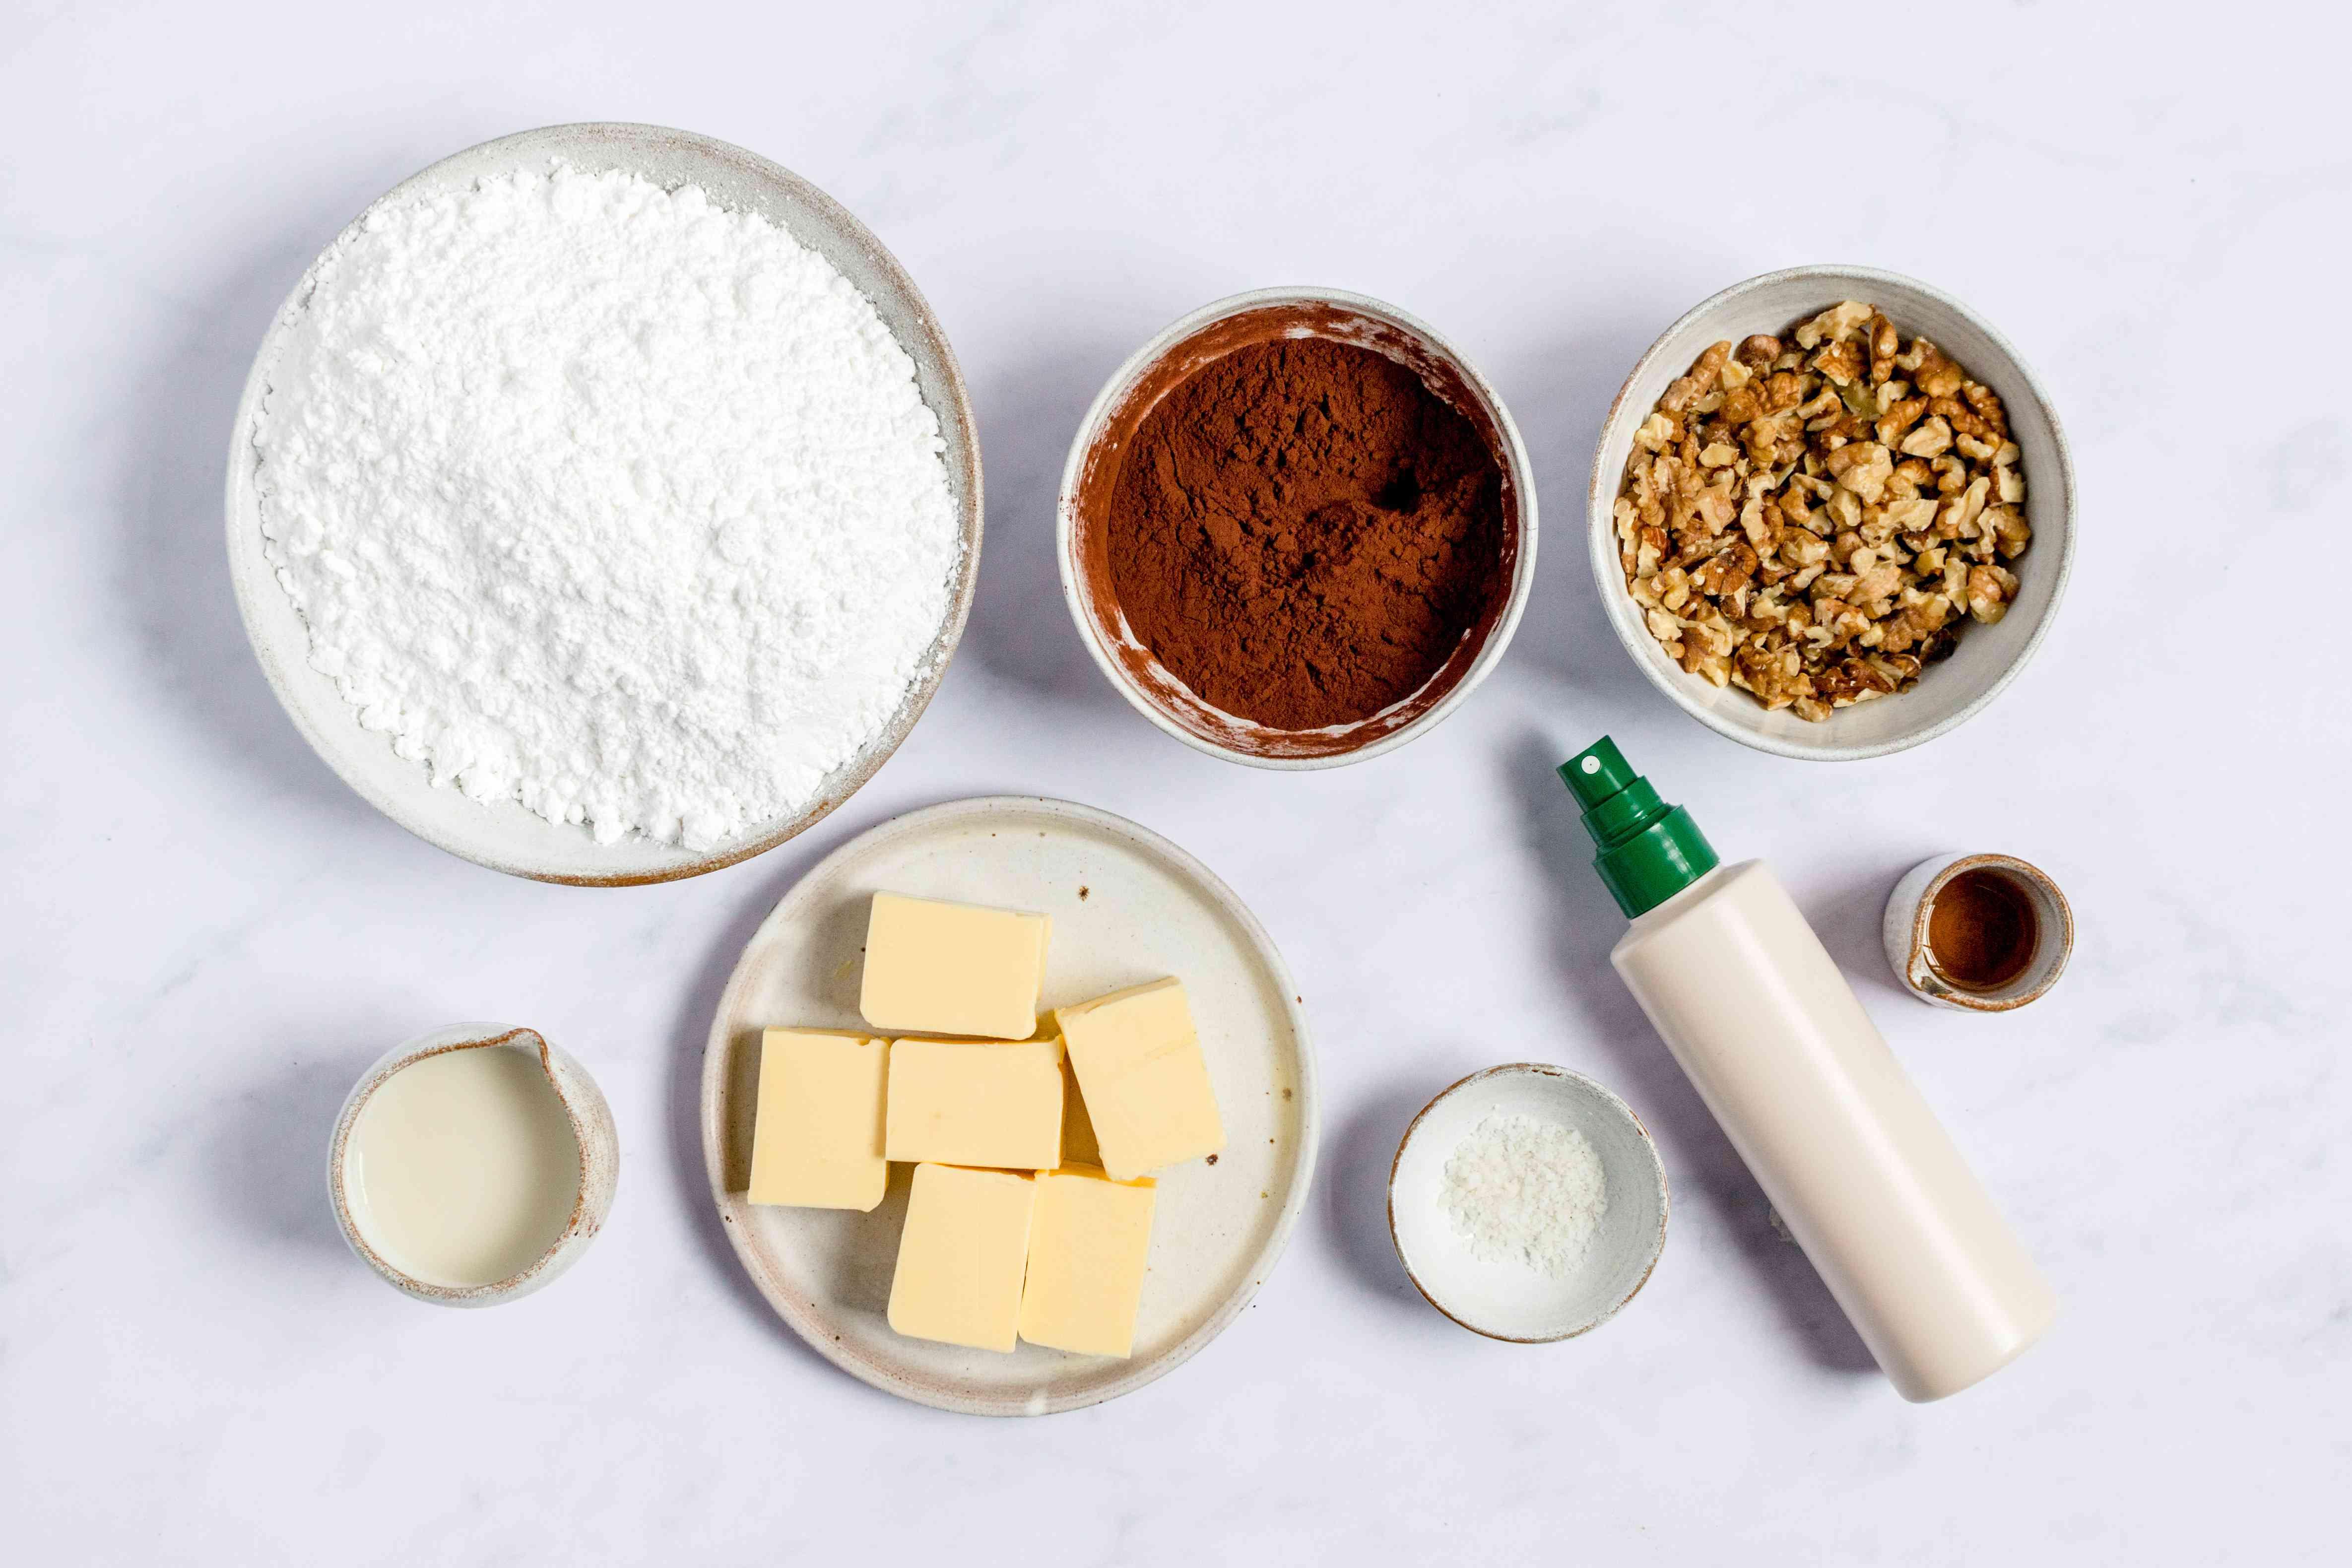 Dairy-free and vegan fudge ingredients